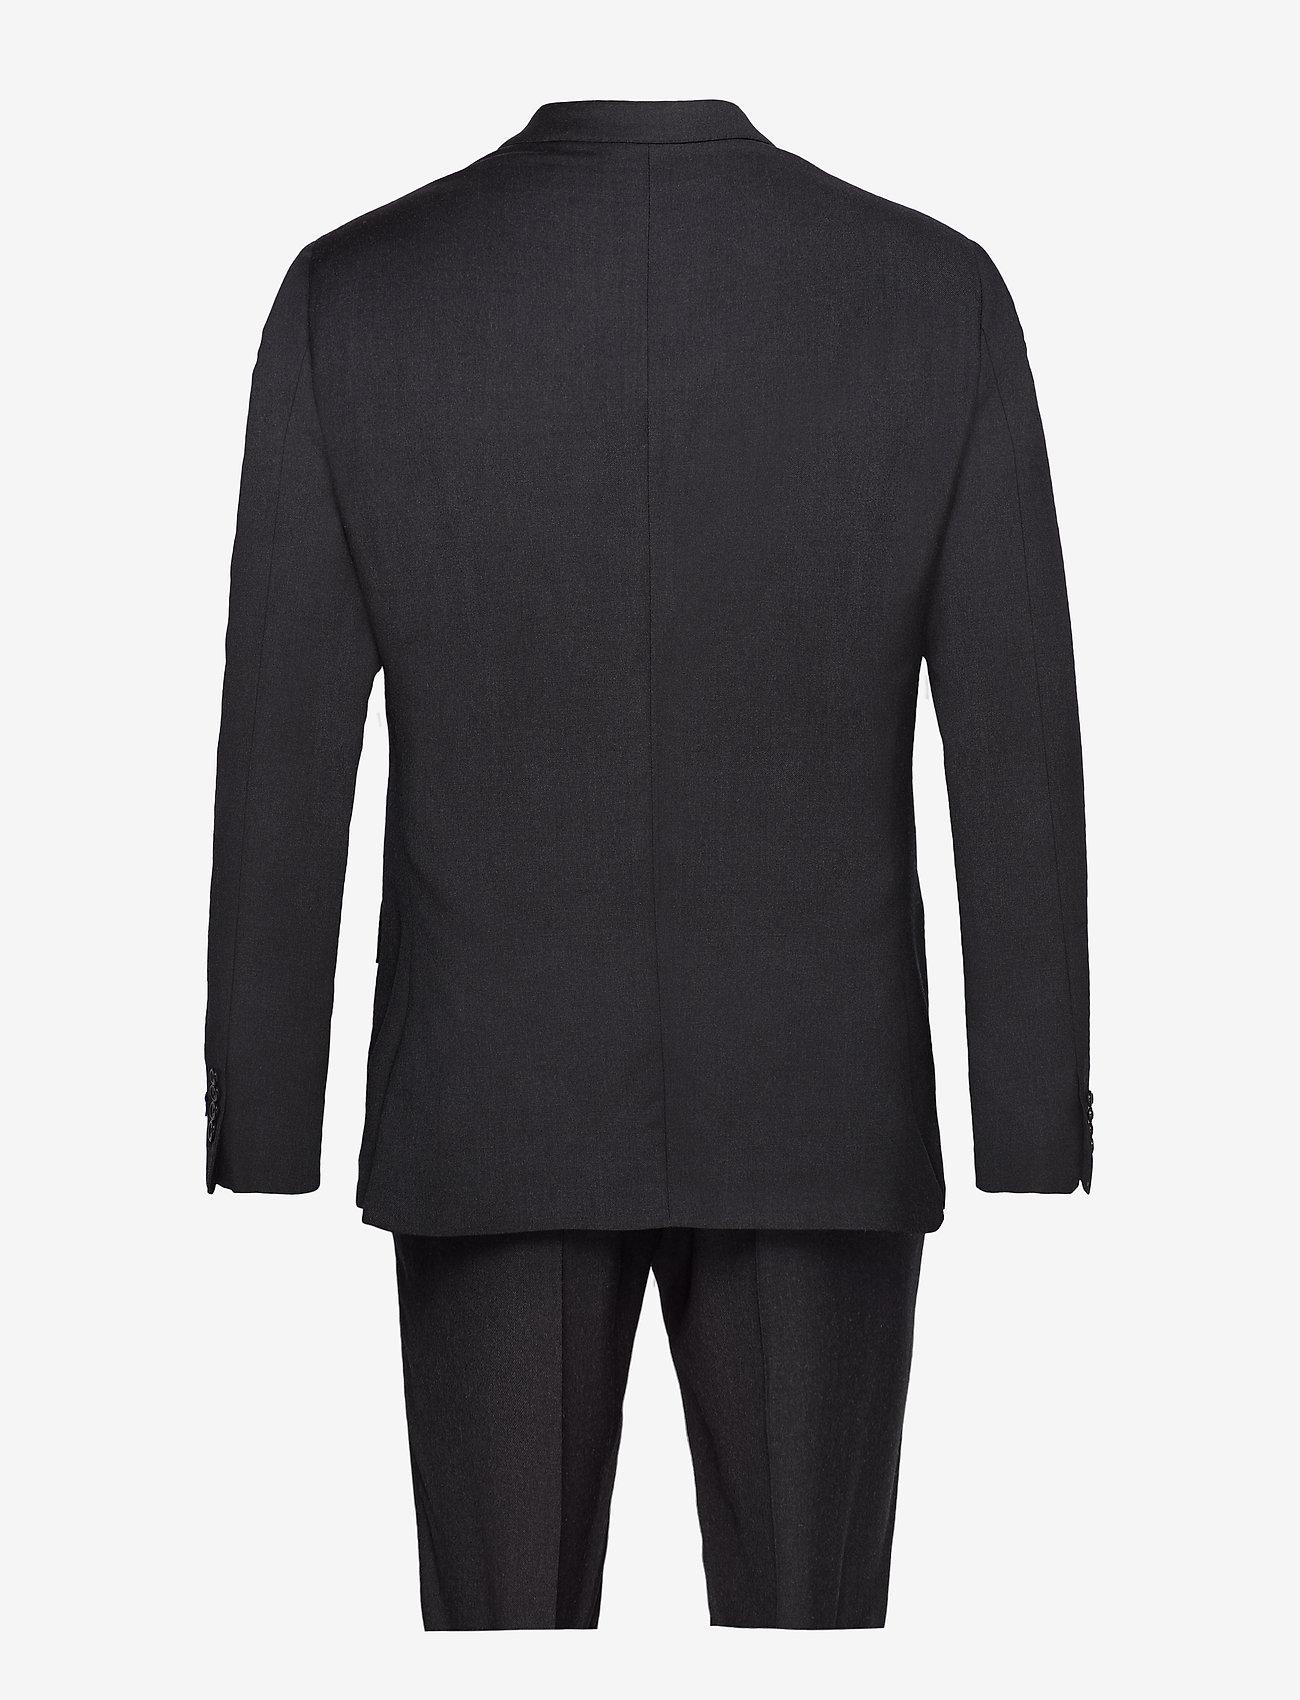 Polo Ralph Lauren - Polo Wool Twill Suit - Žaketes ar vienas pogas aizdari - charcoal - 1